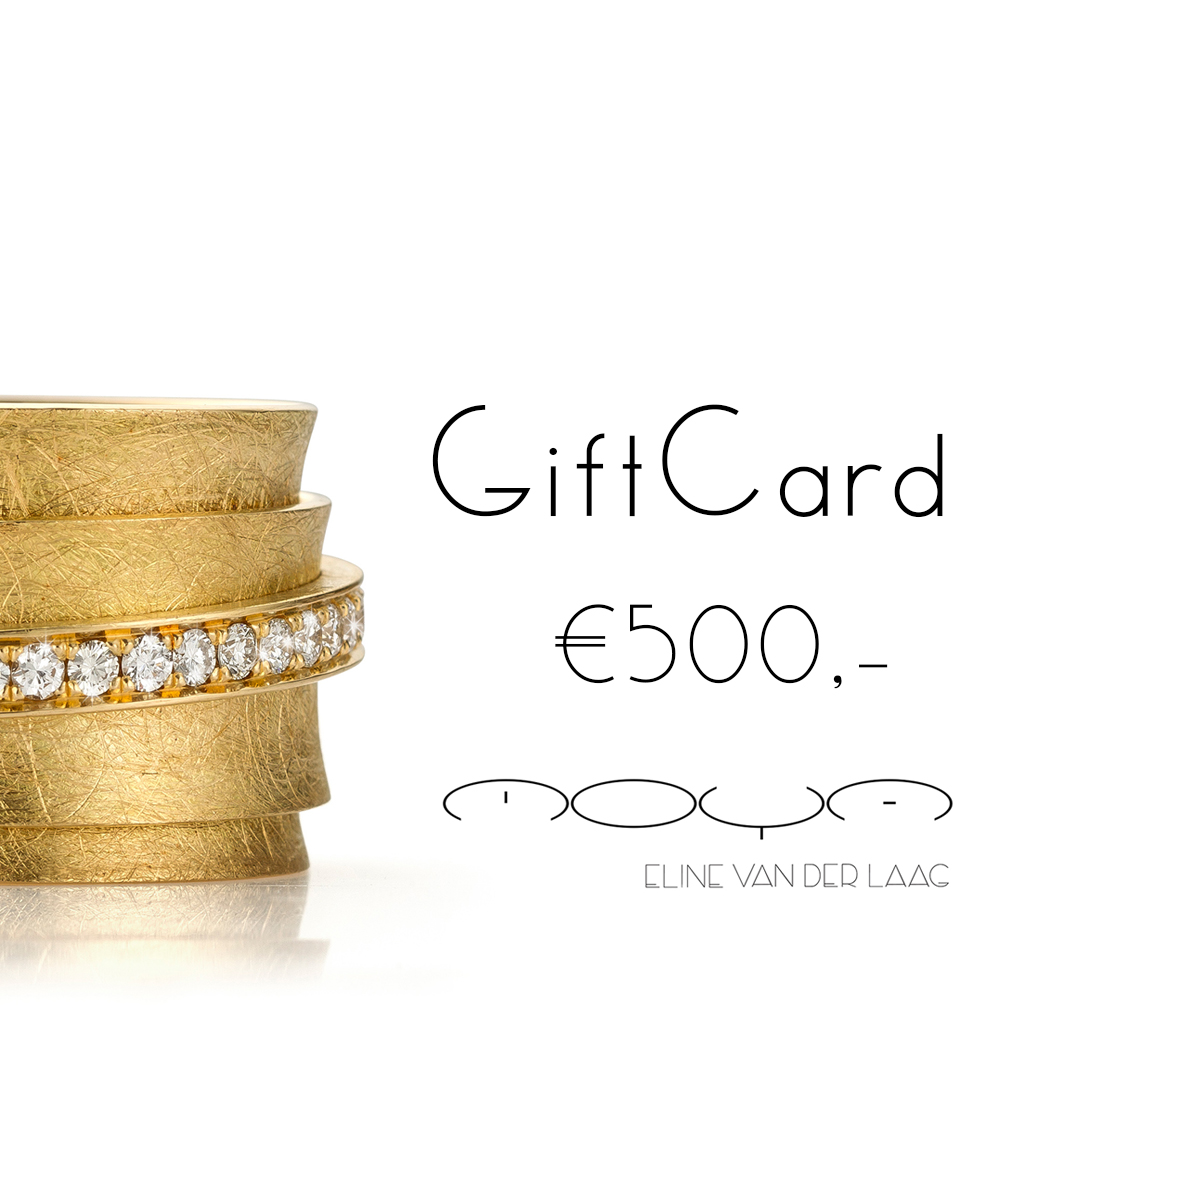 MOYA gift card 500